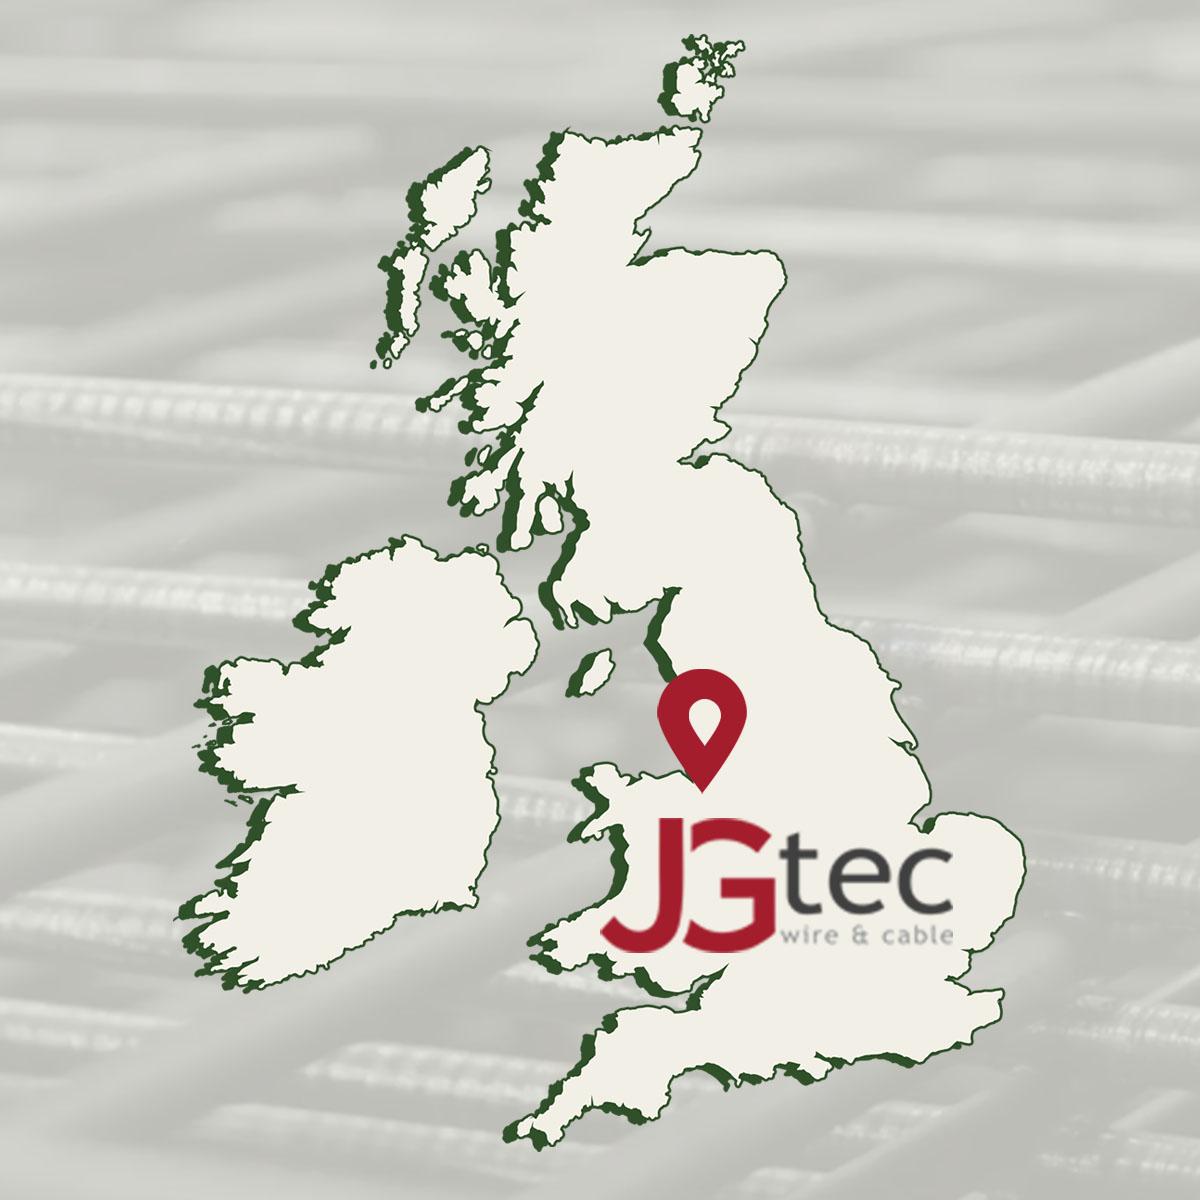 VARO_jgtec_map